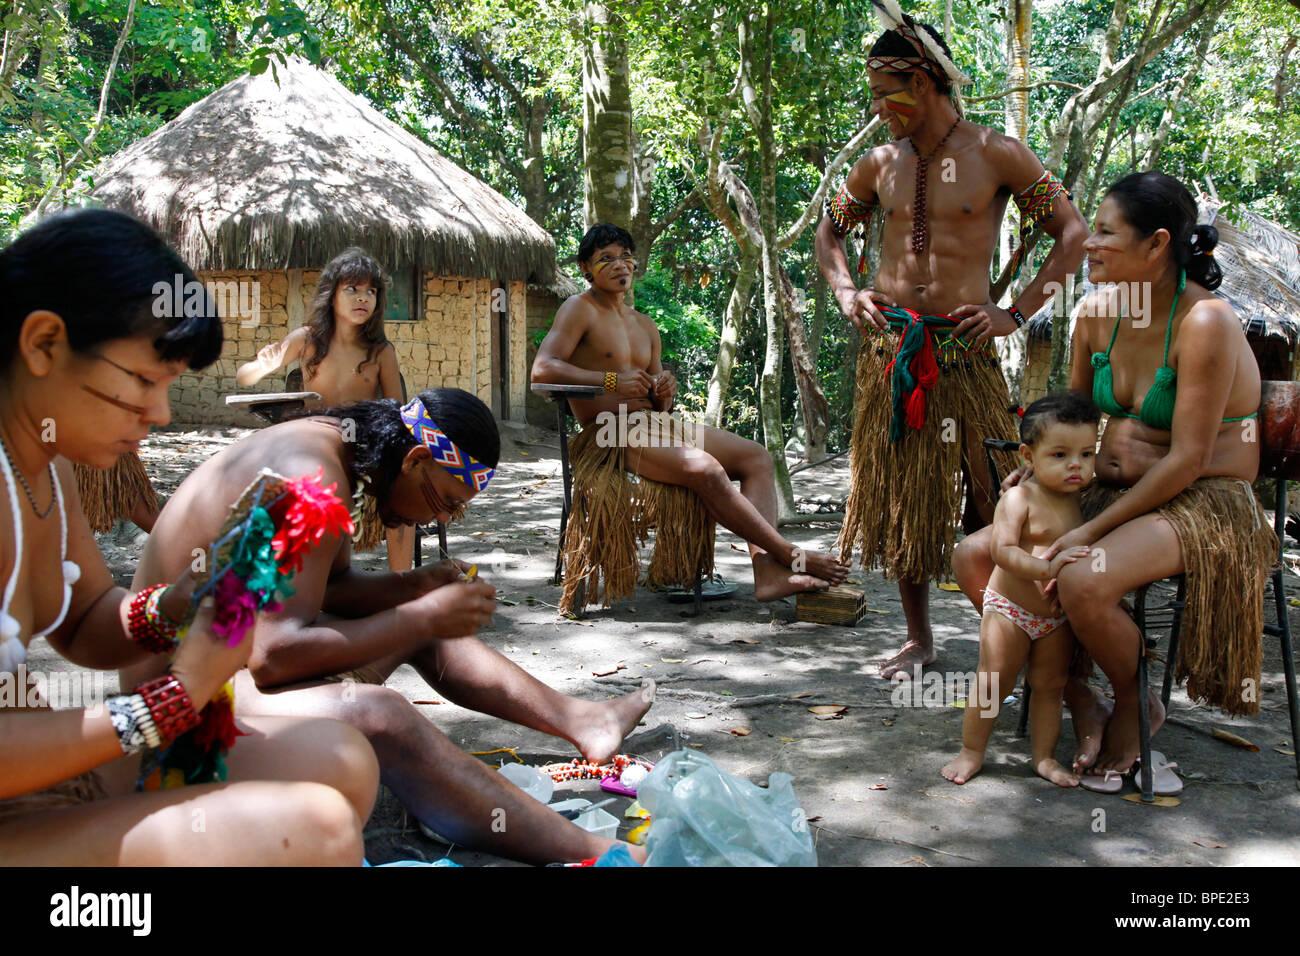 Pataxo Indian people at the Reserva Indigena da Jaqueira near Porto Seguro, Bahia, Brazil. - Stock Image